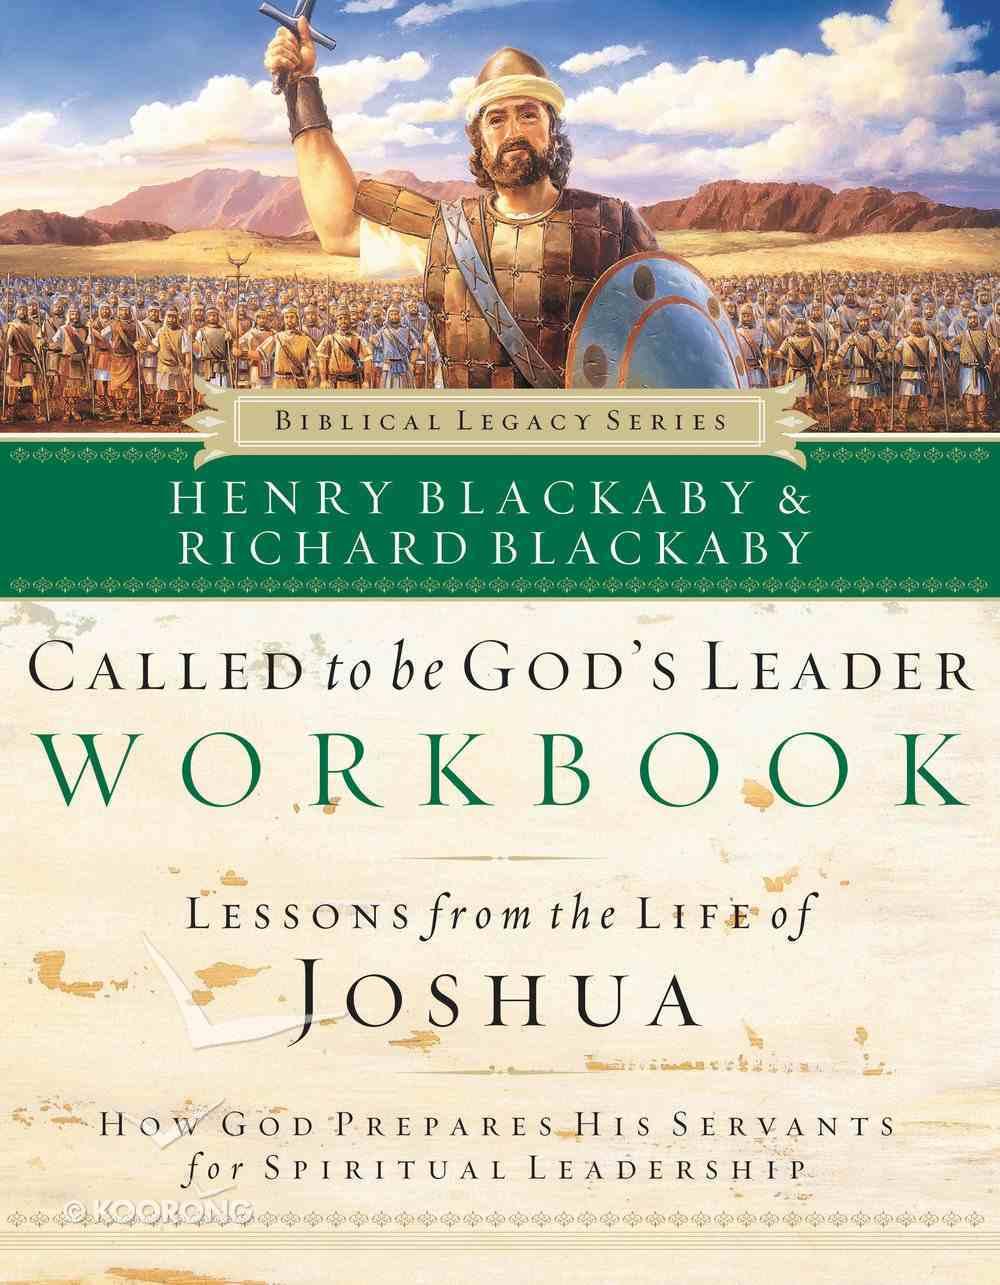 Called to Be God's Leader (Workbook) (Biblical Legacy Series) eBook